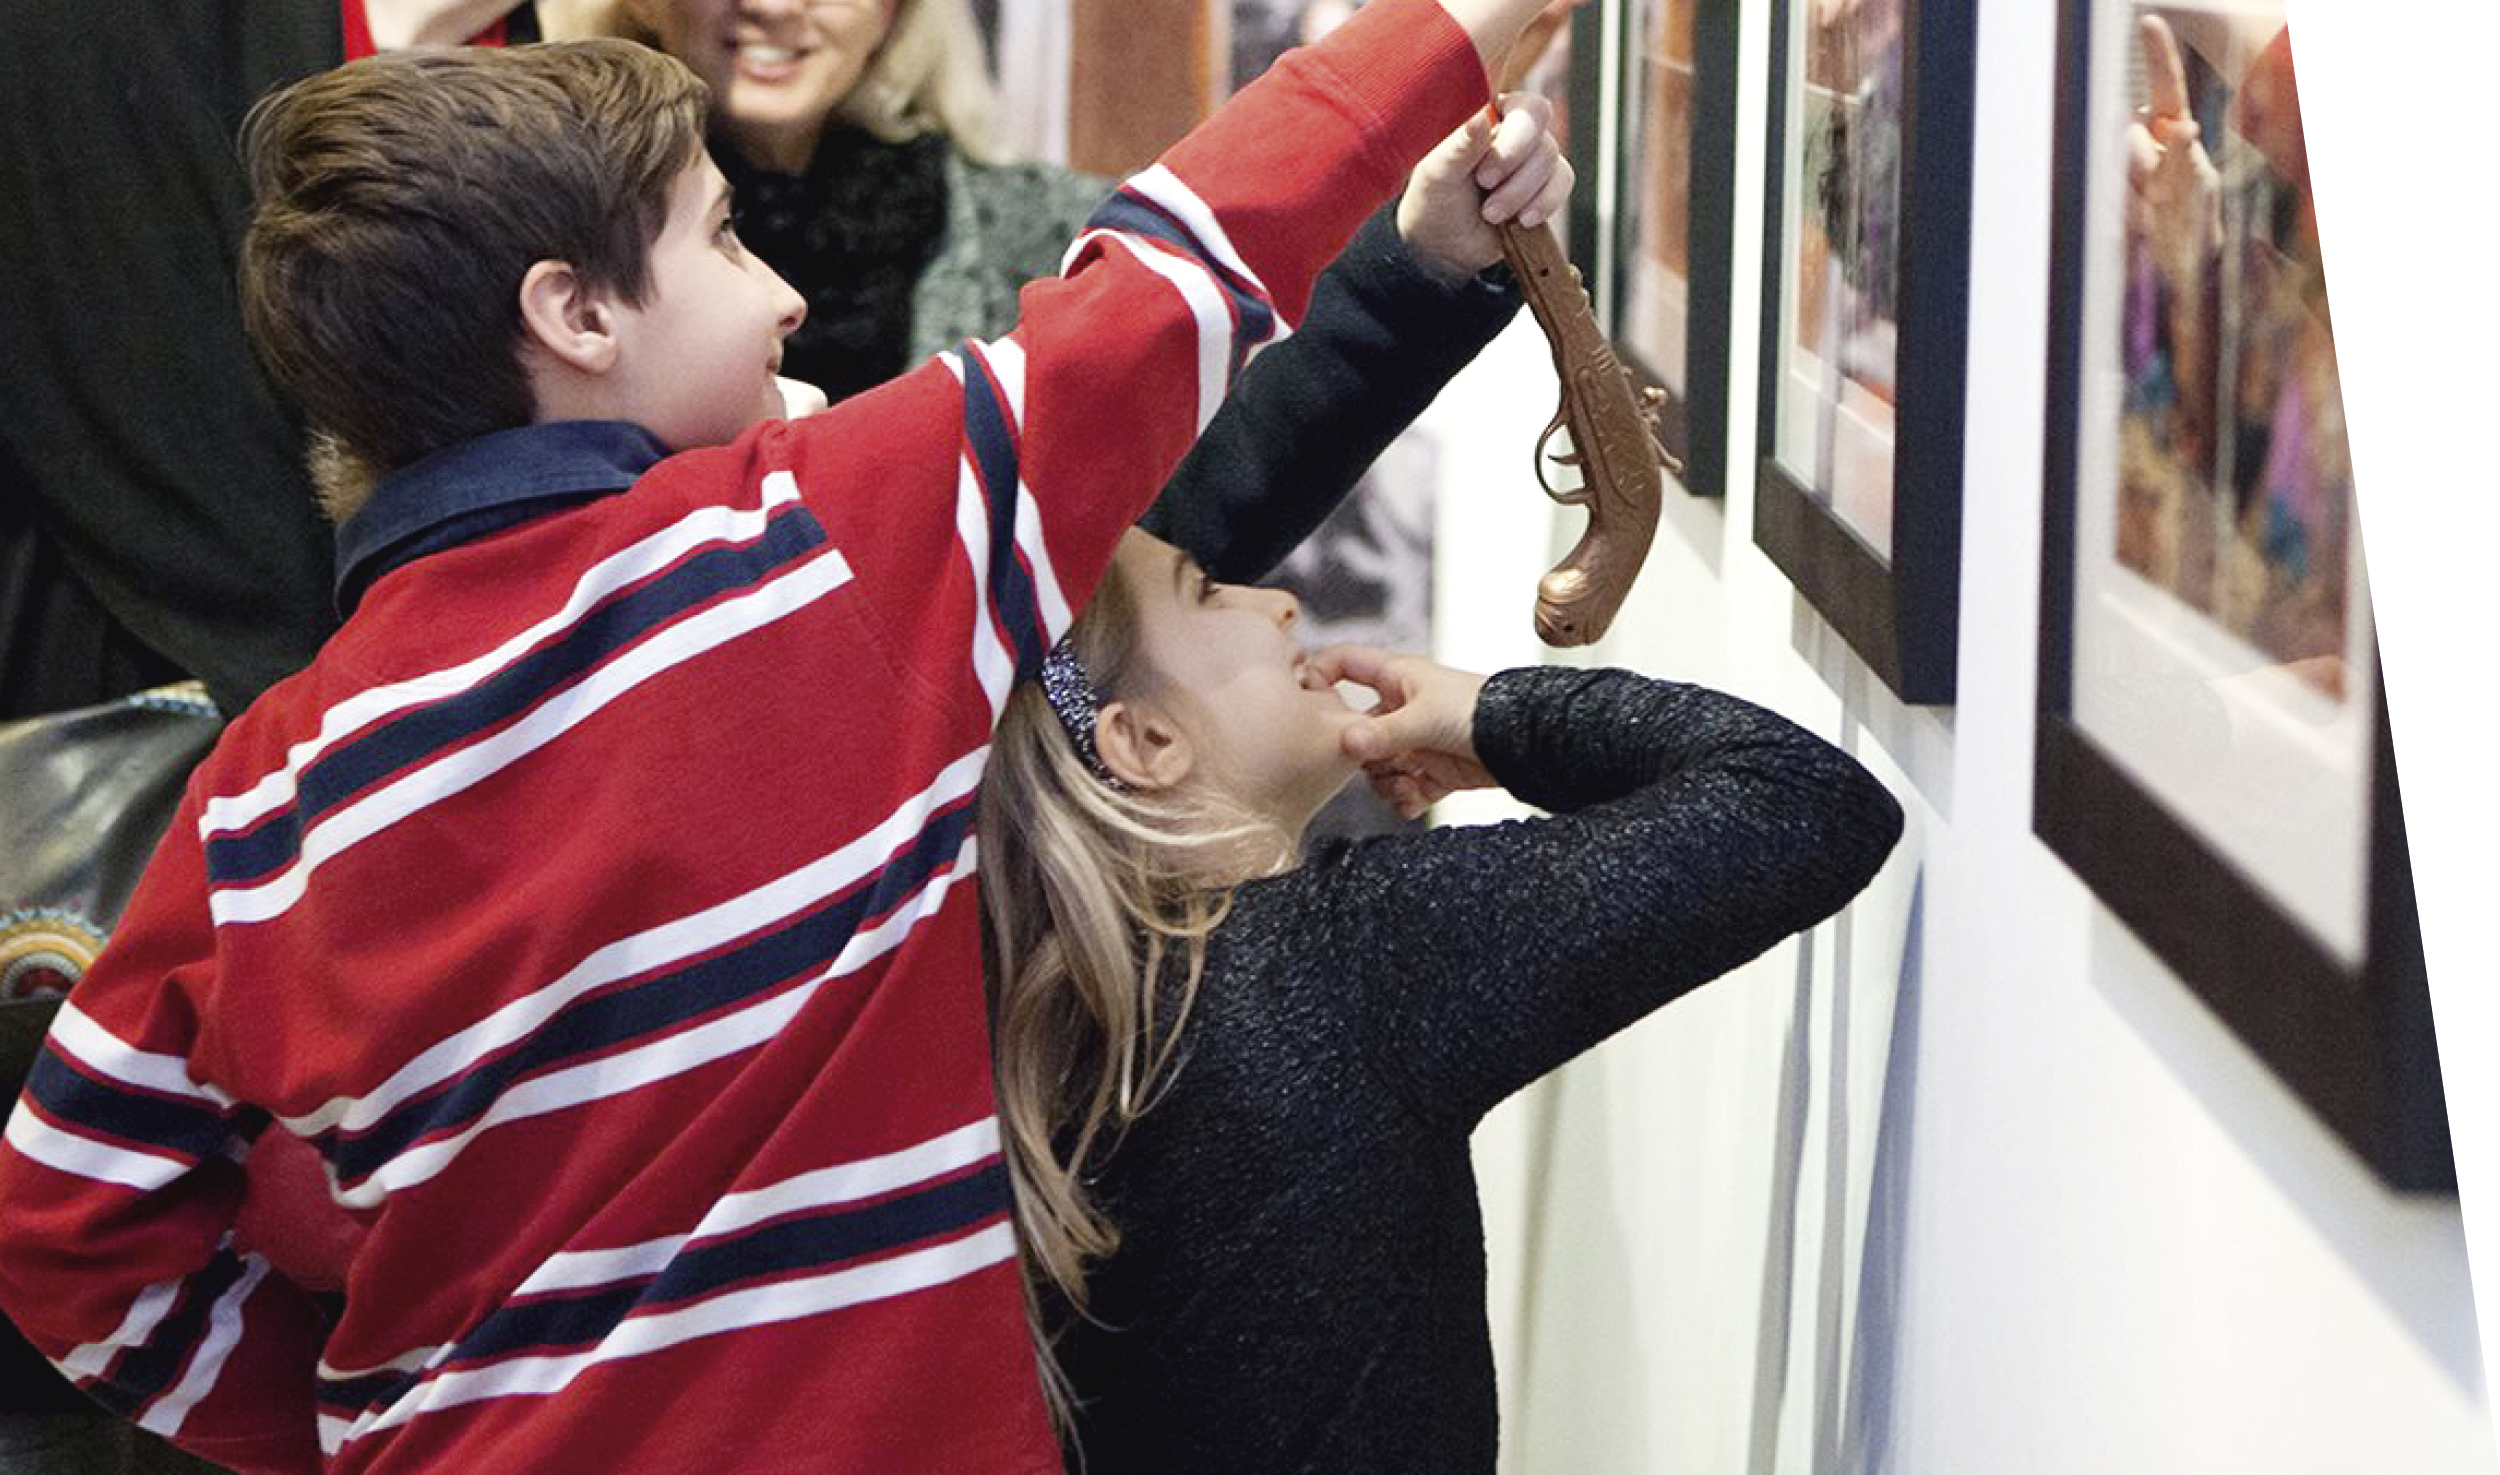 Visita Guidata Per I Bambini (6 - 12 Anni), Visite guidate